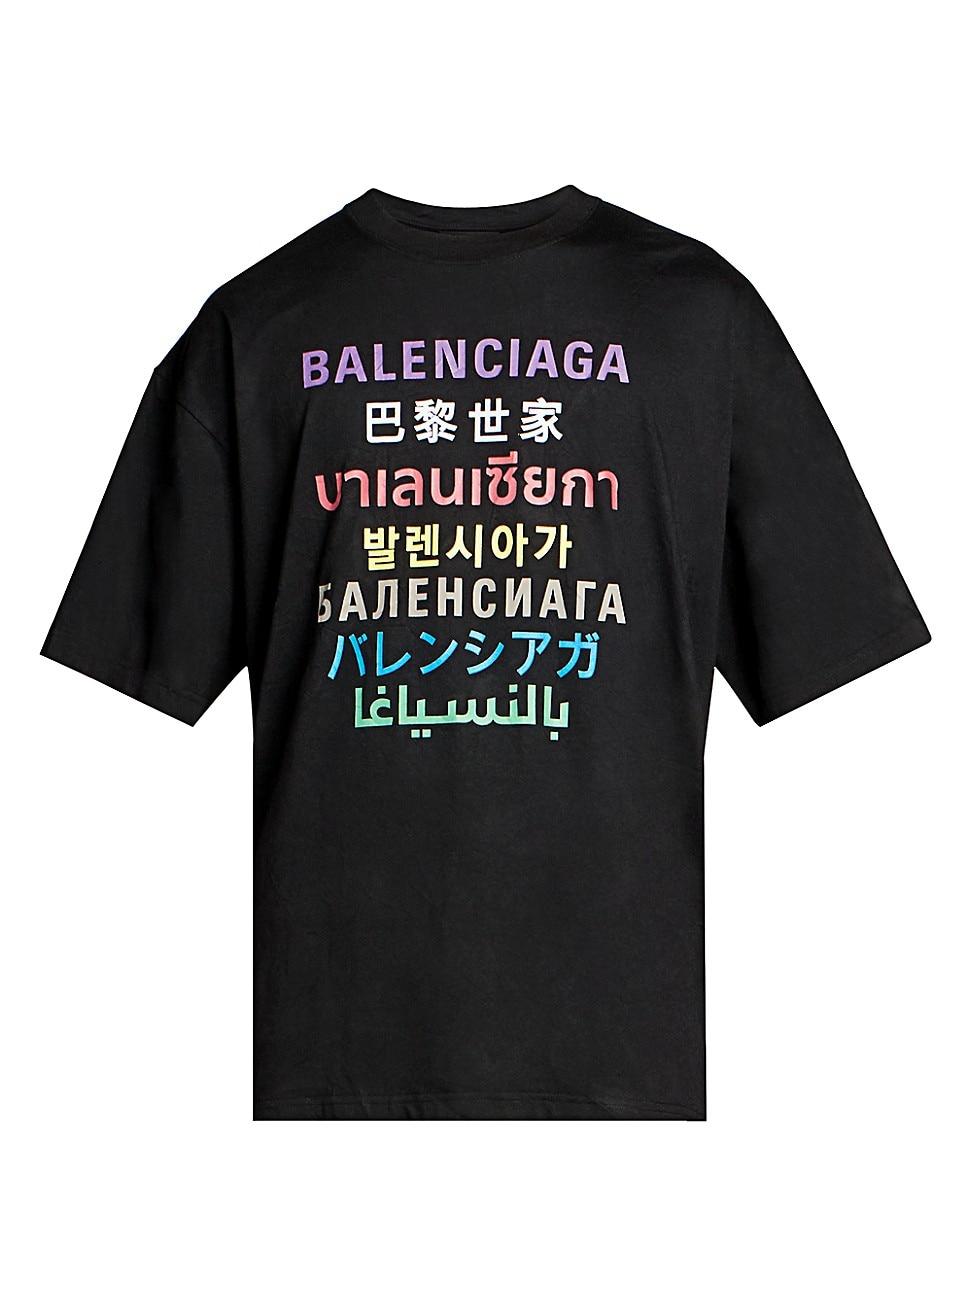 Balenciaga Cottons MEN'S MULTI-LANGUAGES LOGO T-SHIRT